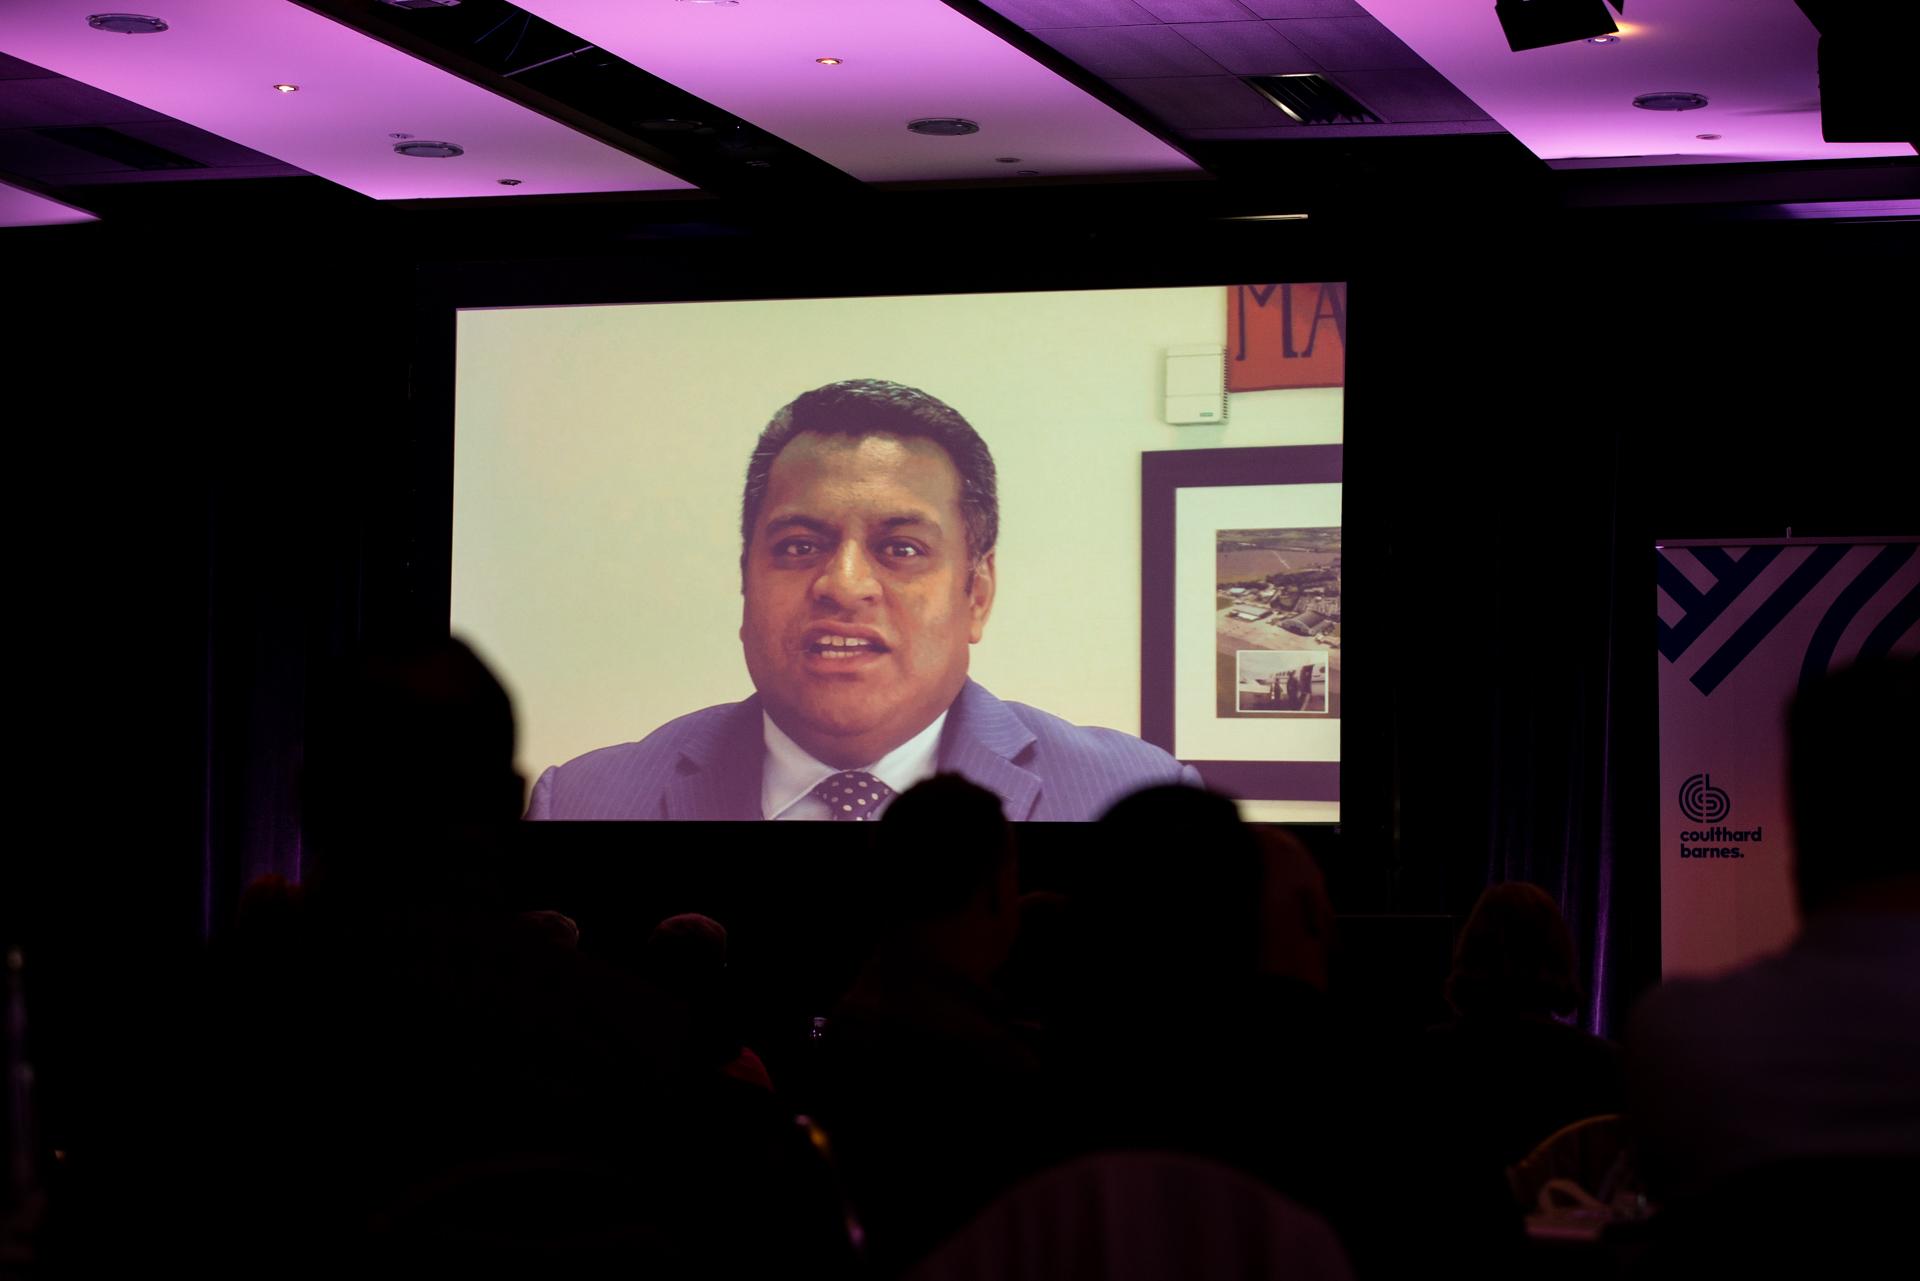 Hon. Kris Faafoi, Minister of Commerce & Consumer Affairs